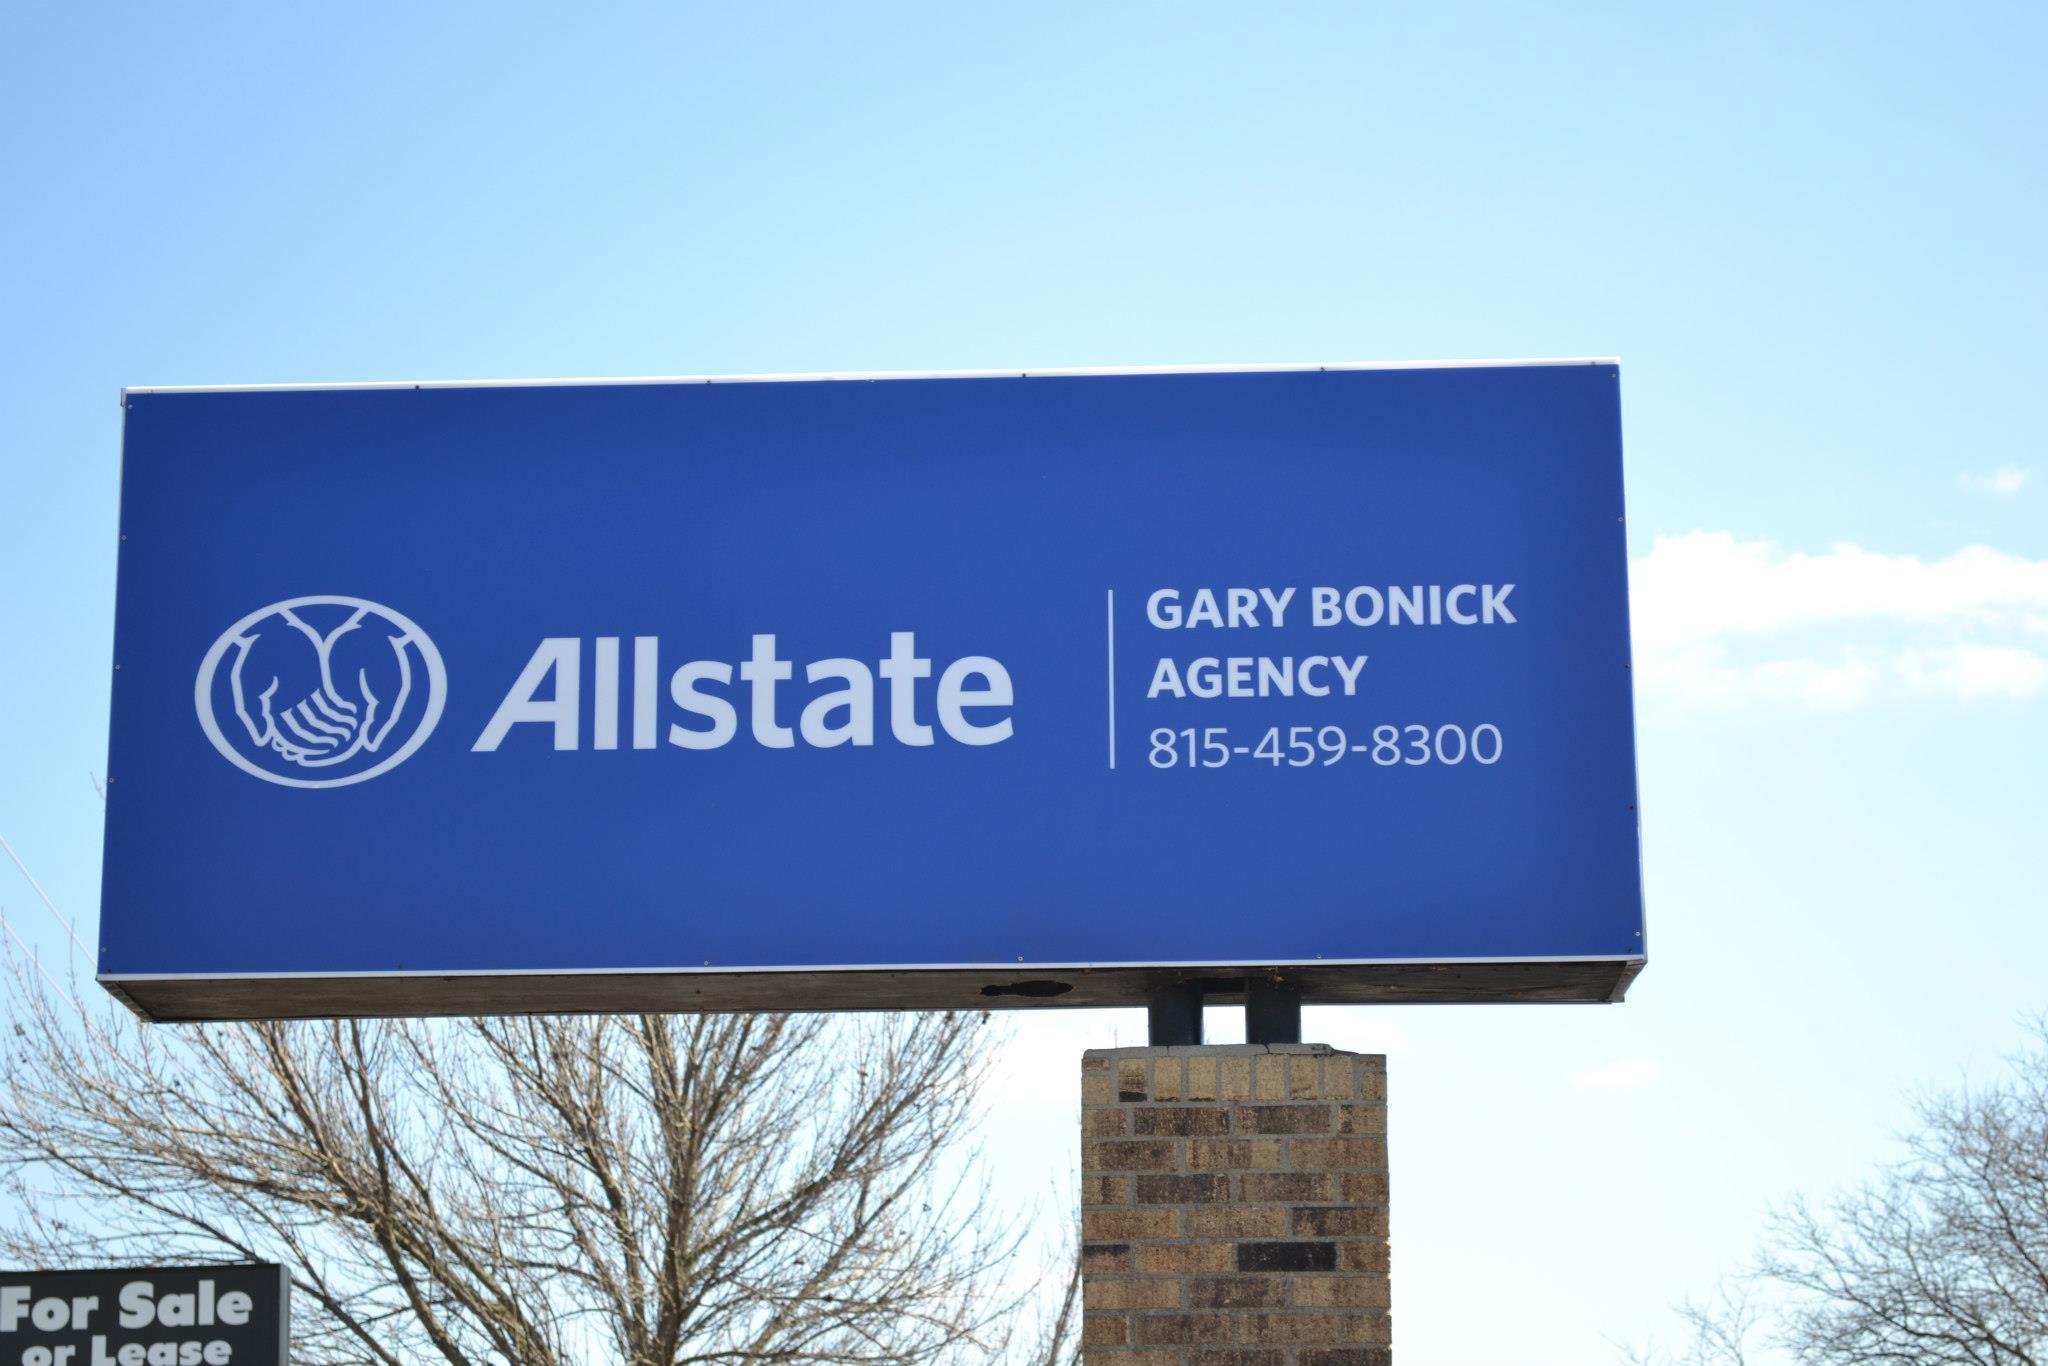 Gary Bonick: Allstate Insurance image 1